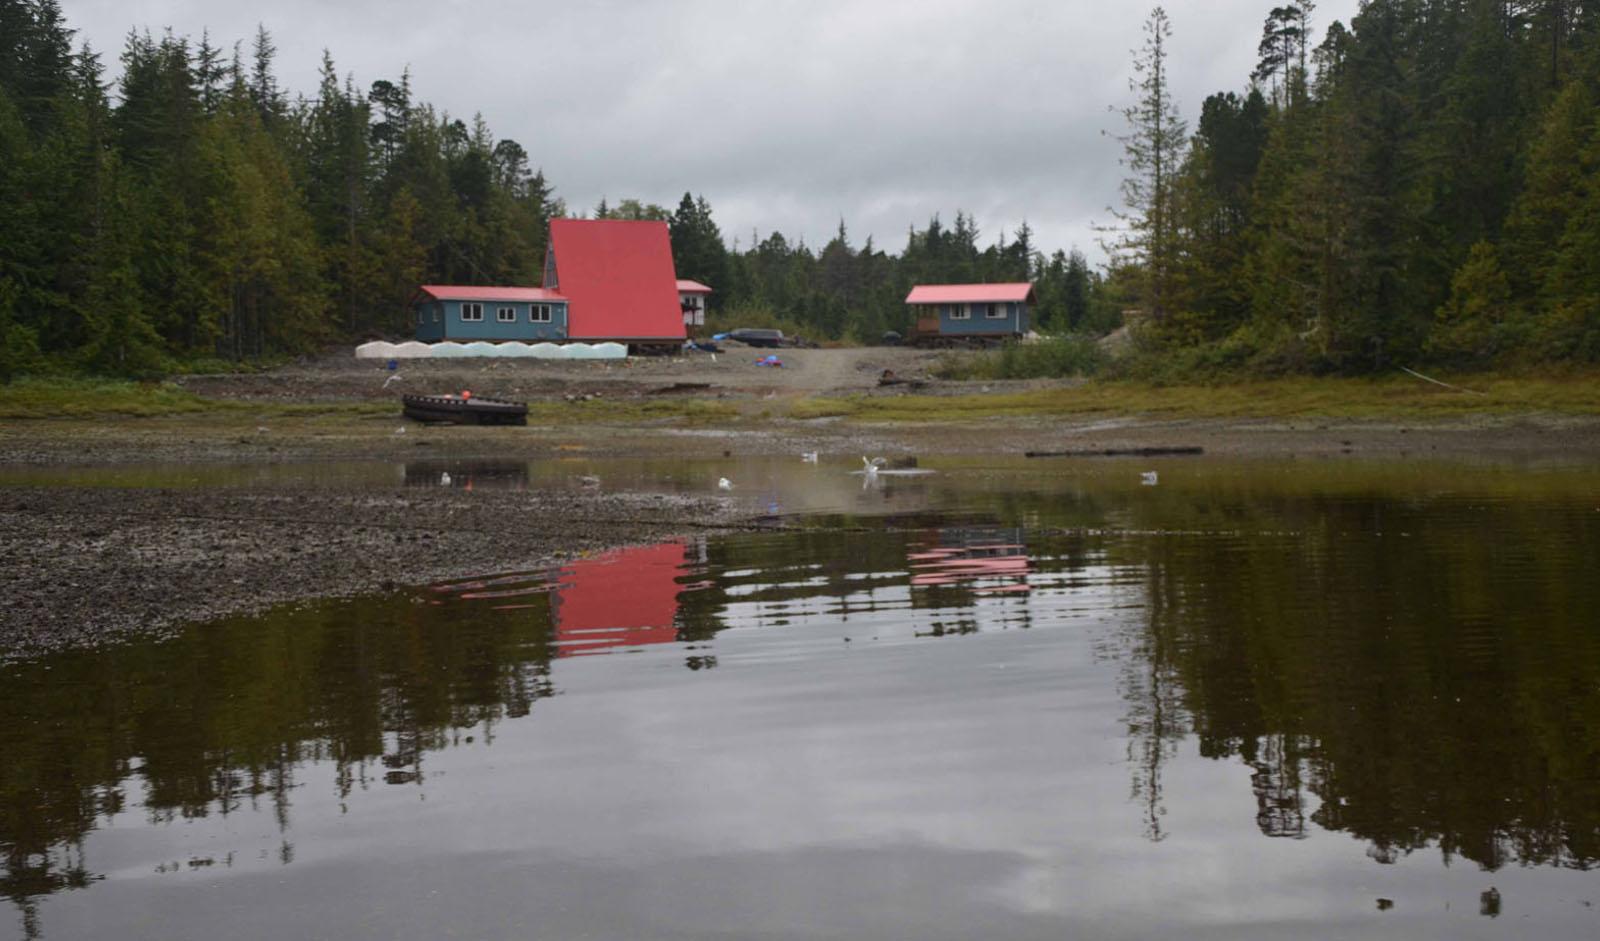 Denny island 10